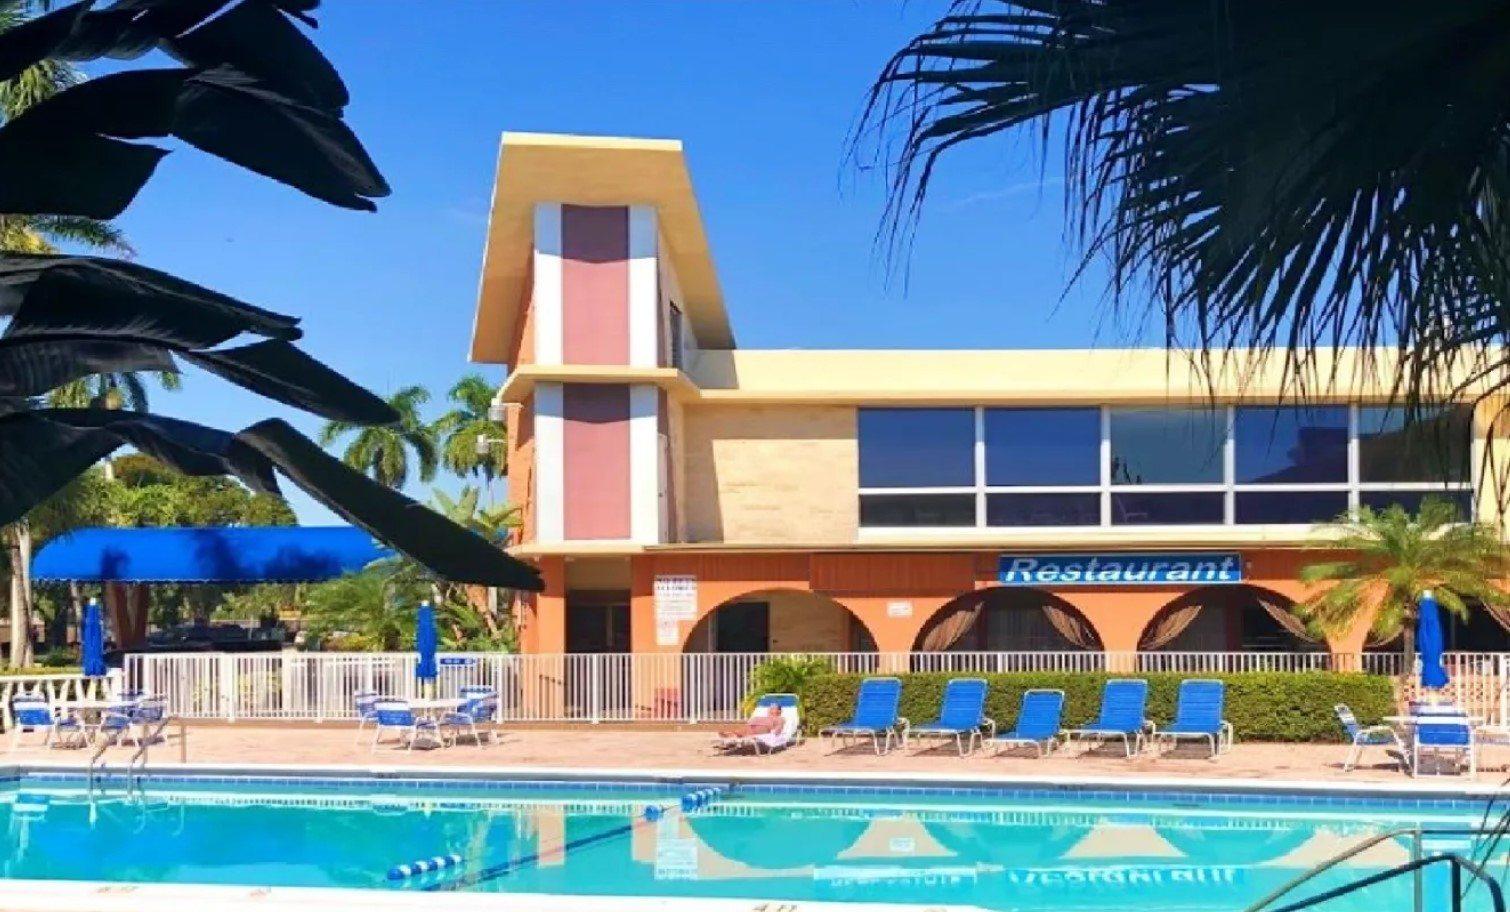 BHostels Hollywood Florida best hostel in Fort Lauderdale